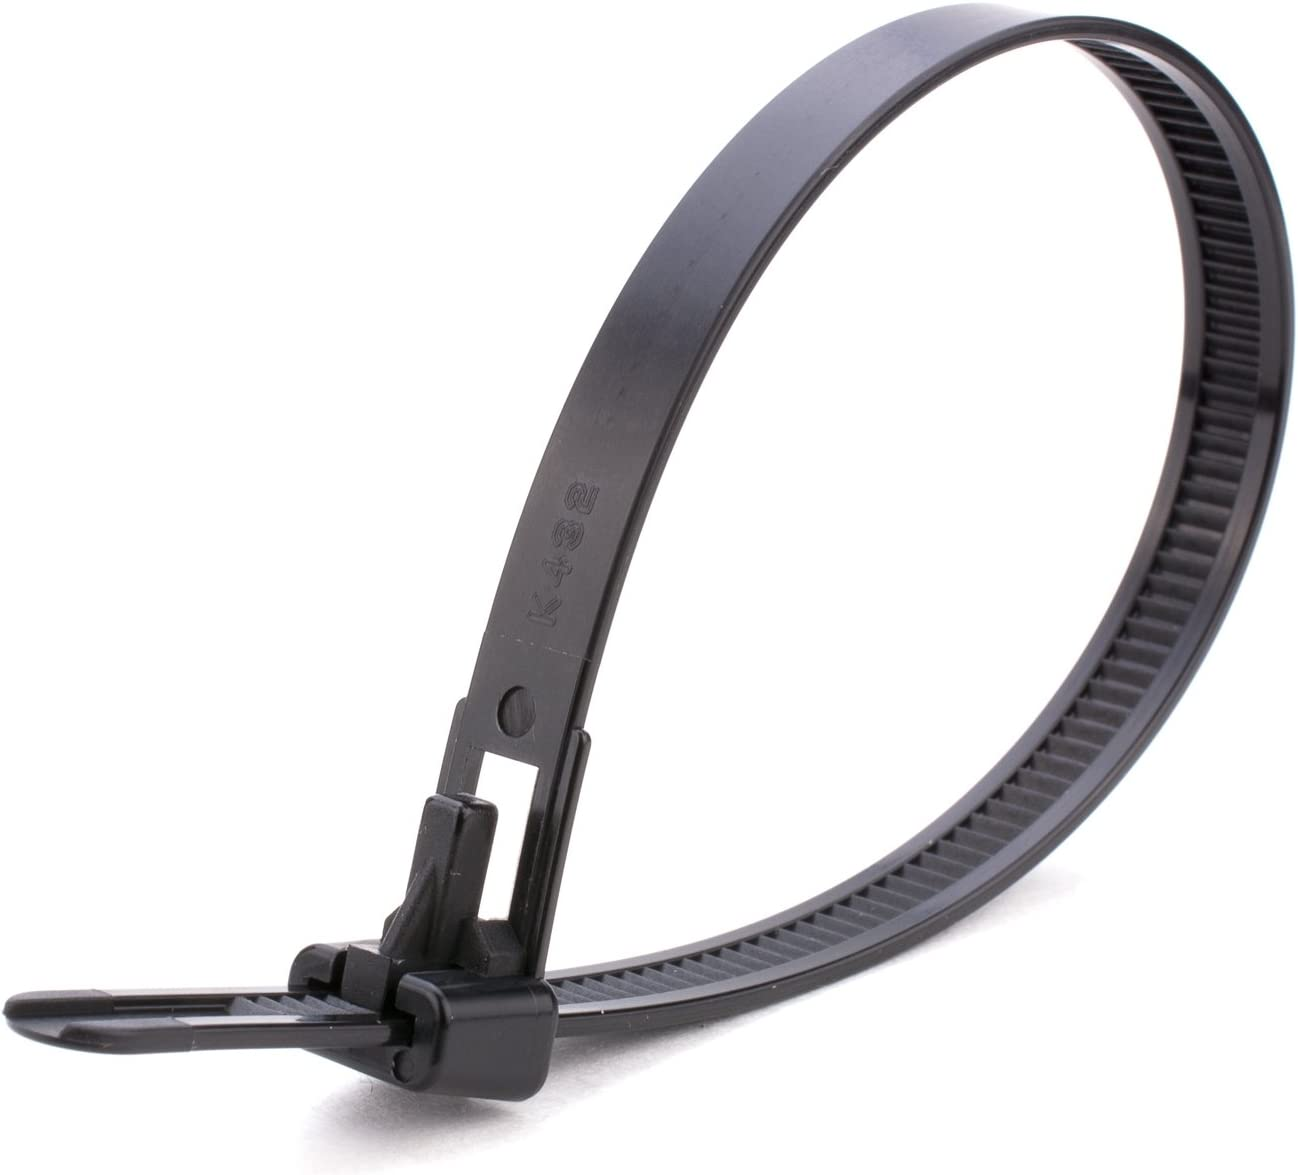 Kable Kontrol Reusable Releasable Zip Ties - Black - 6'' inch long - 50 Lbs Tensile Strength (100 Pcs/pack)